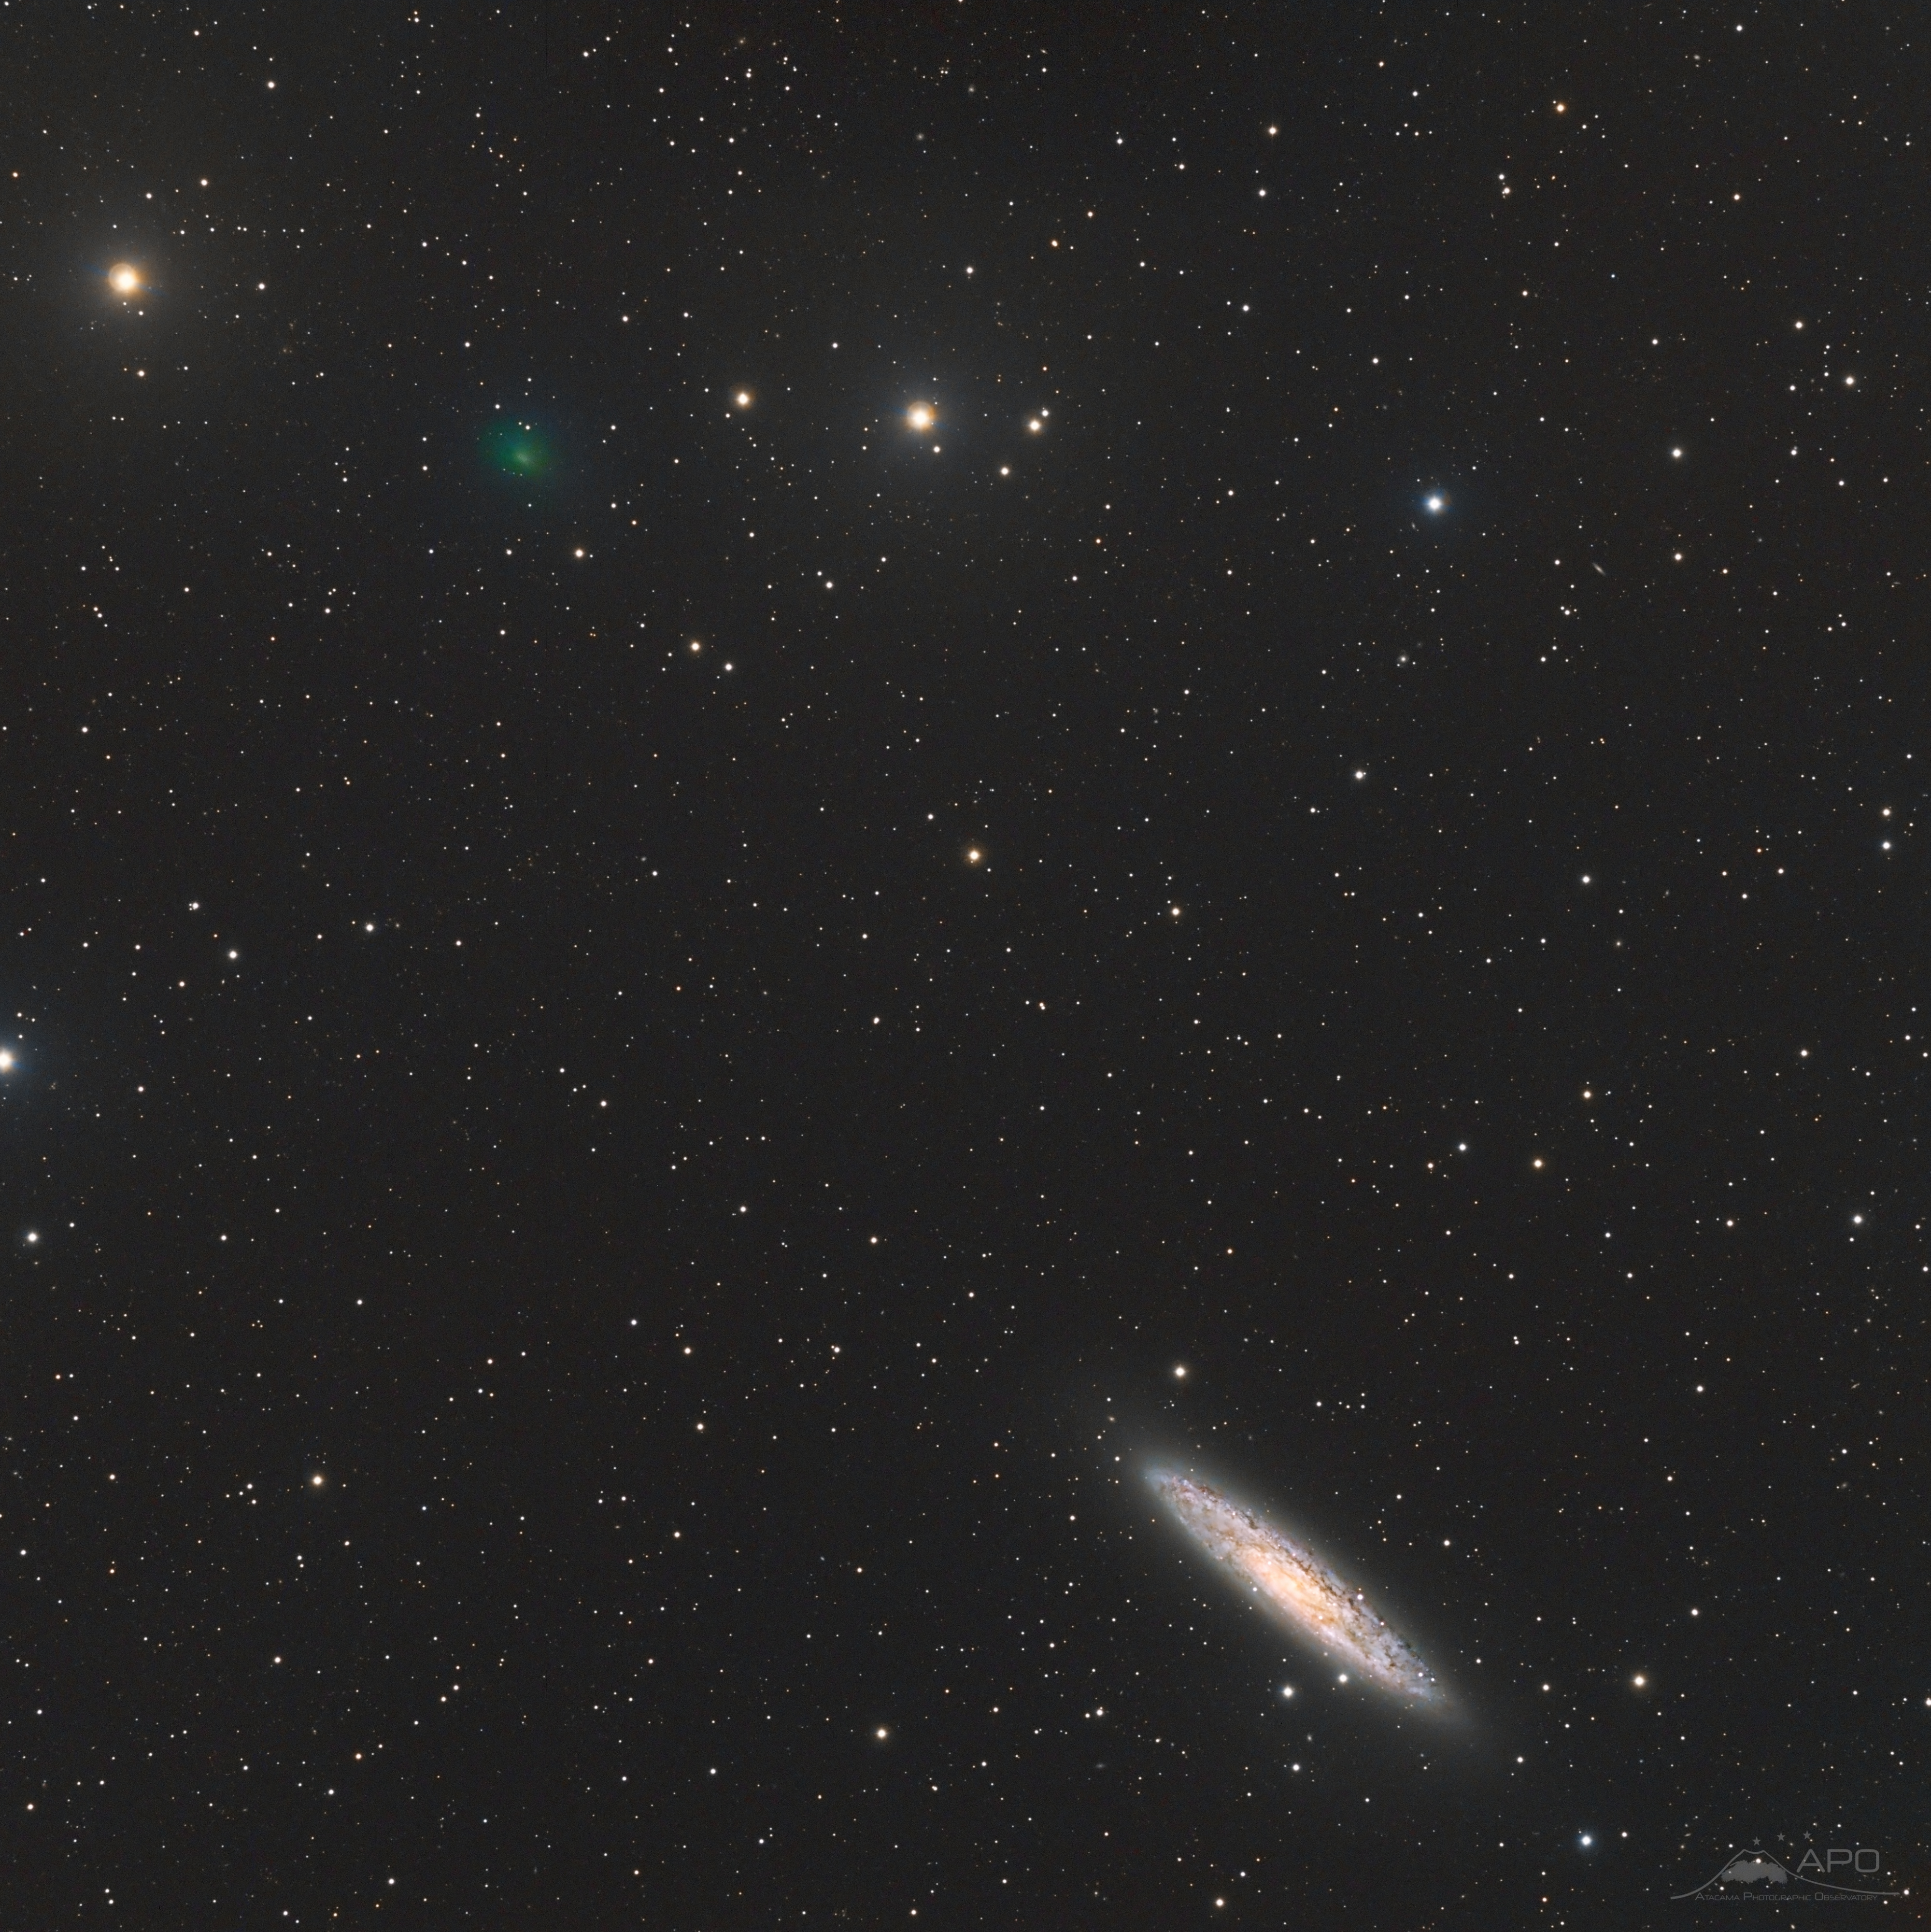 Comète 66P-du_Toit_NGC253_TOA150_U16M_APO.jpg